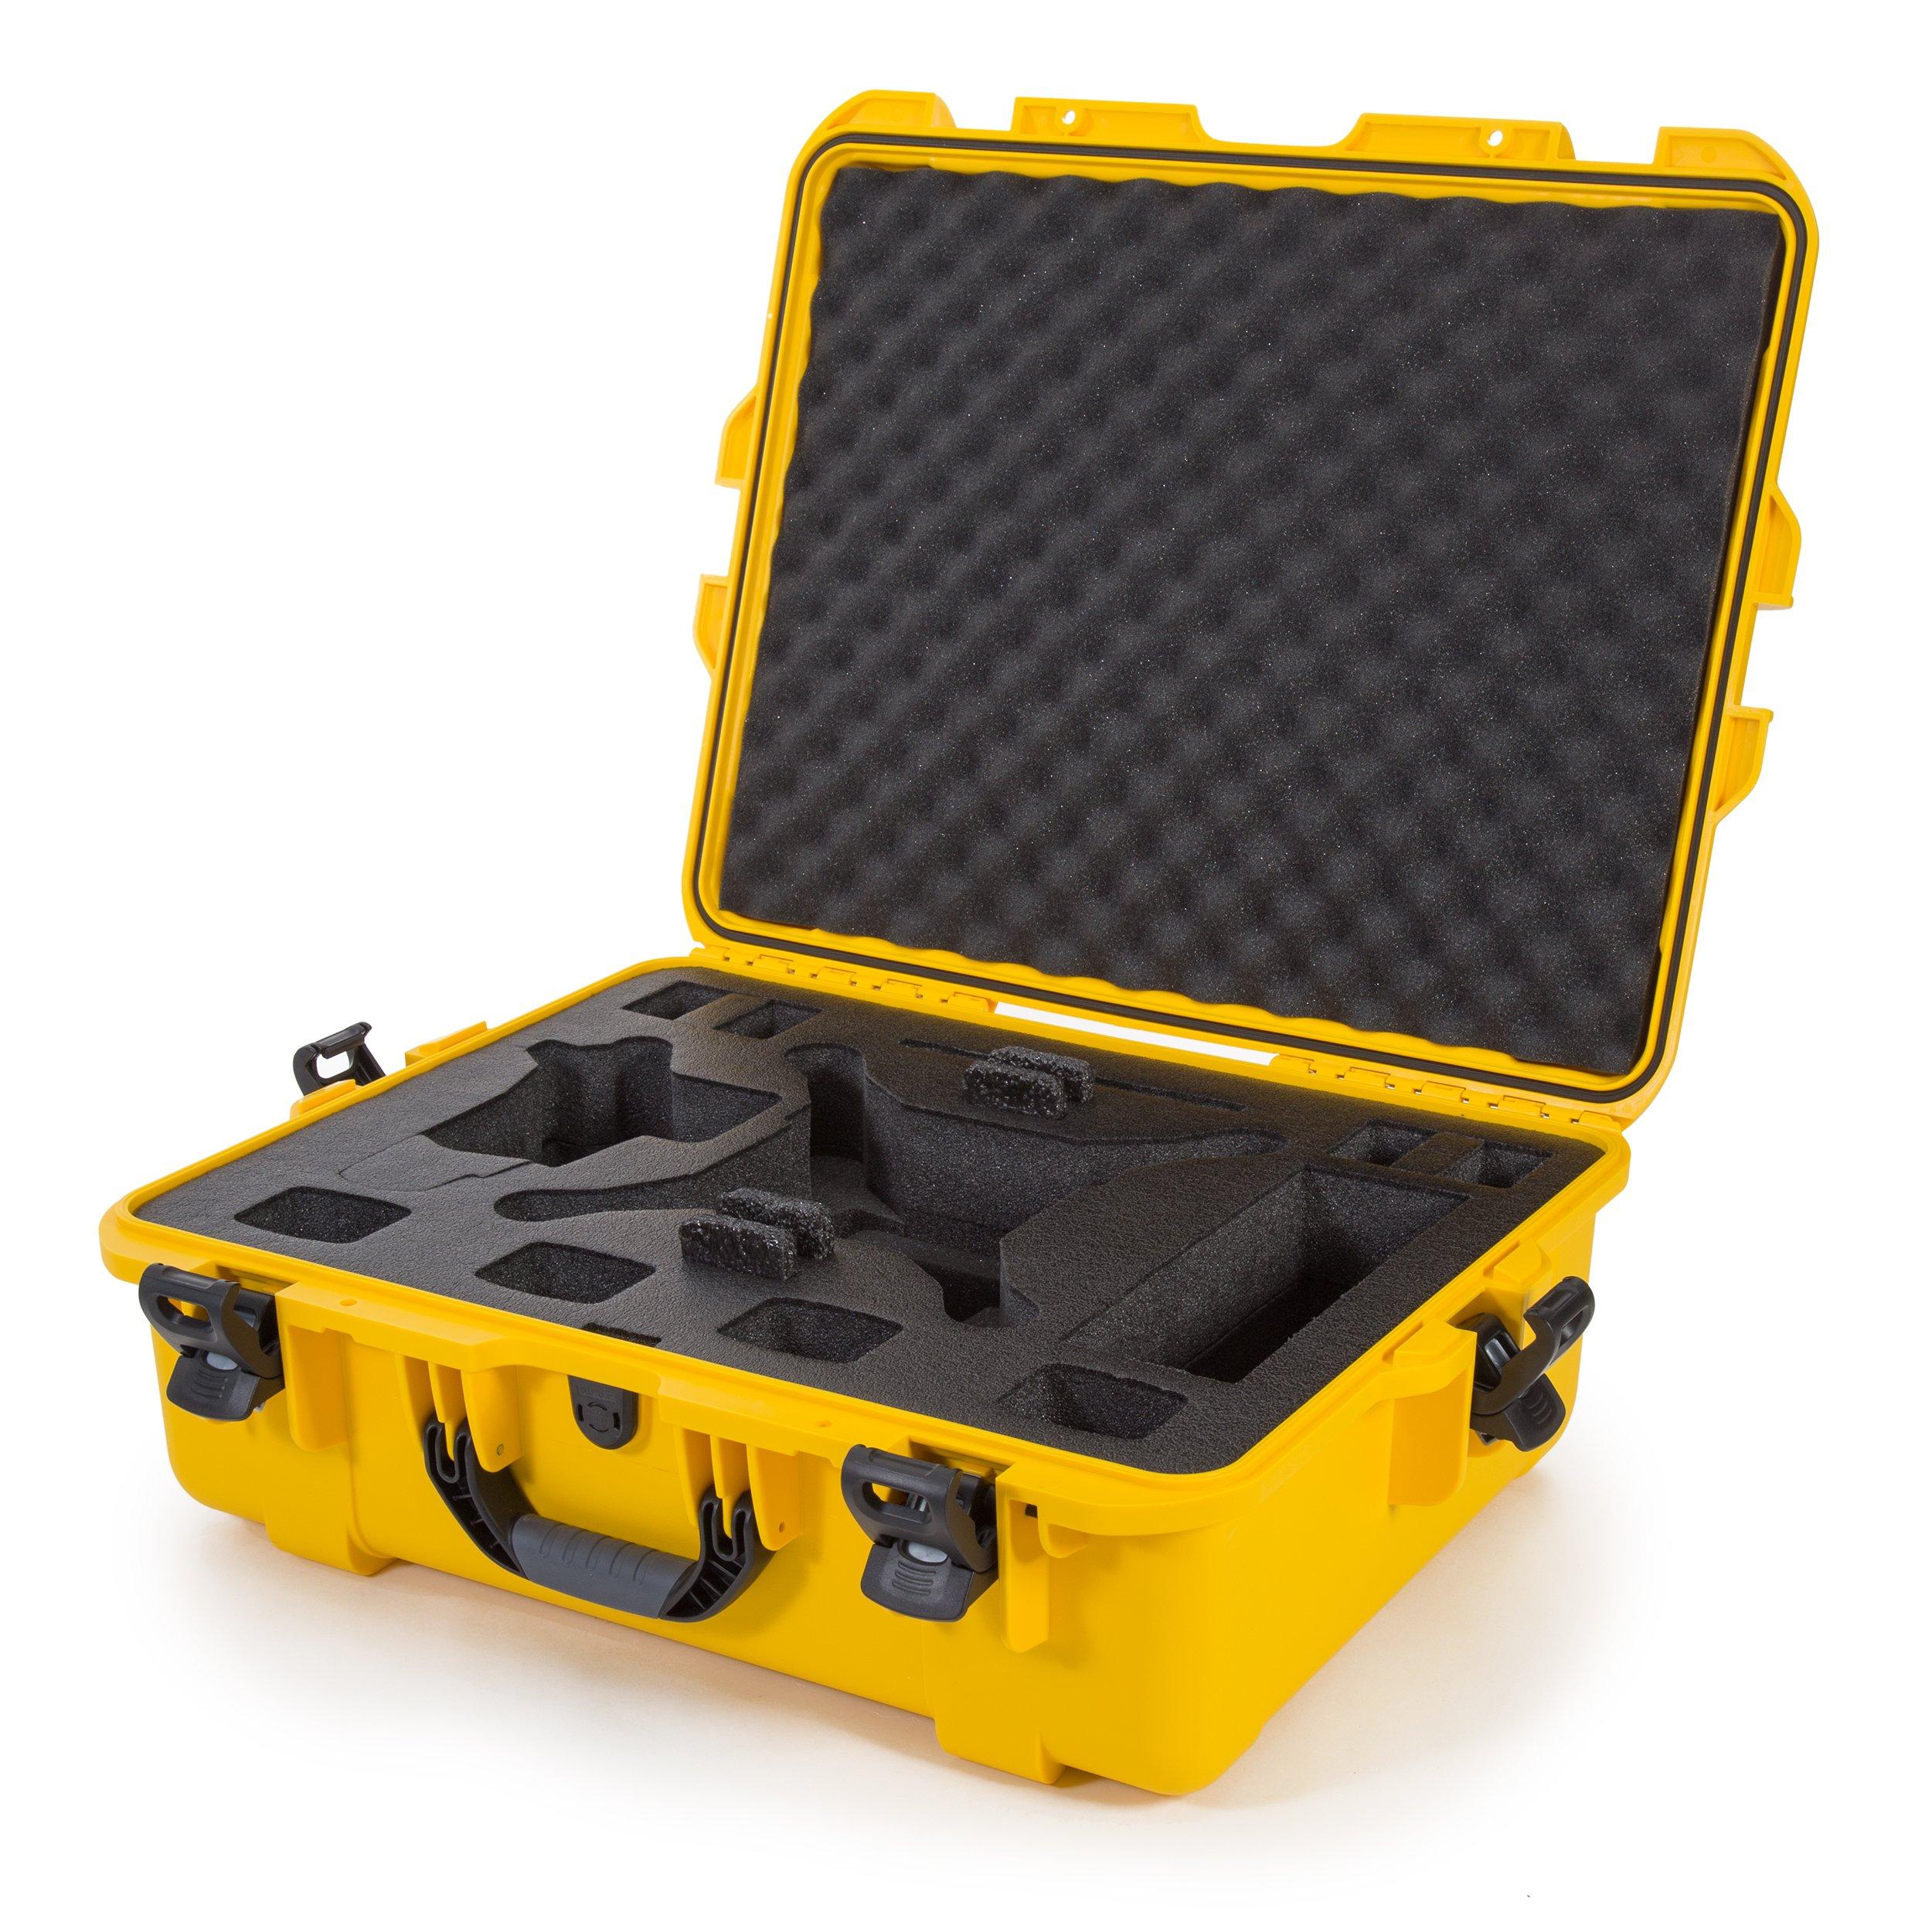 Nanuk DJI Drone Waterproof Hard Case with Custom Foam Insert for DJI Phantom 4/ Phantom 4 Pro (Pro+) / Advanced (Advanced+) & Phantom 3-945-DJI44 Yellow by Nanuk